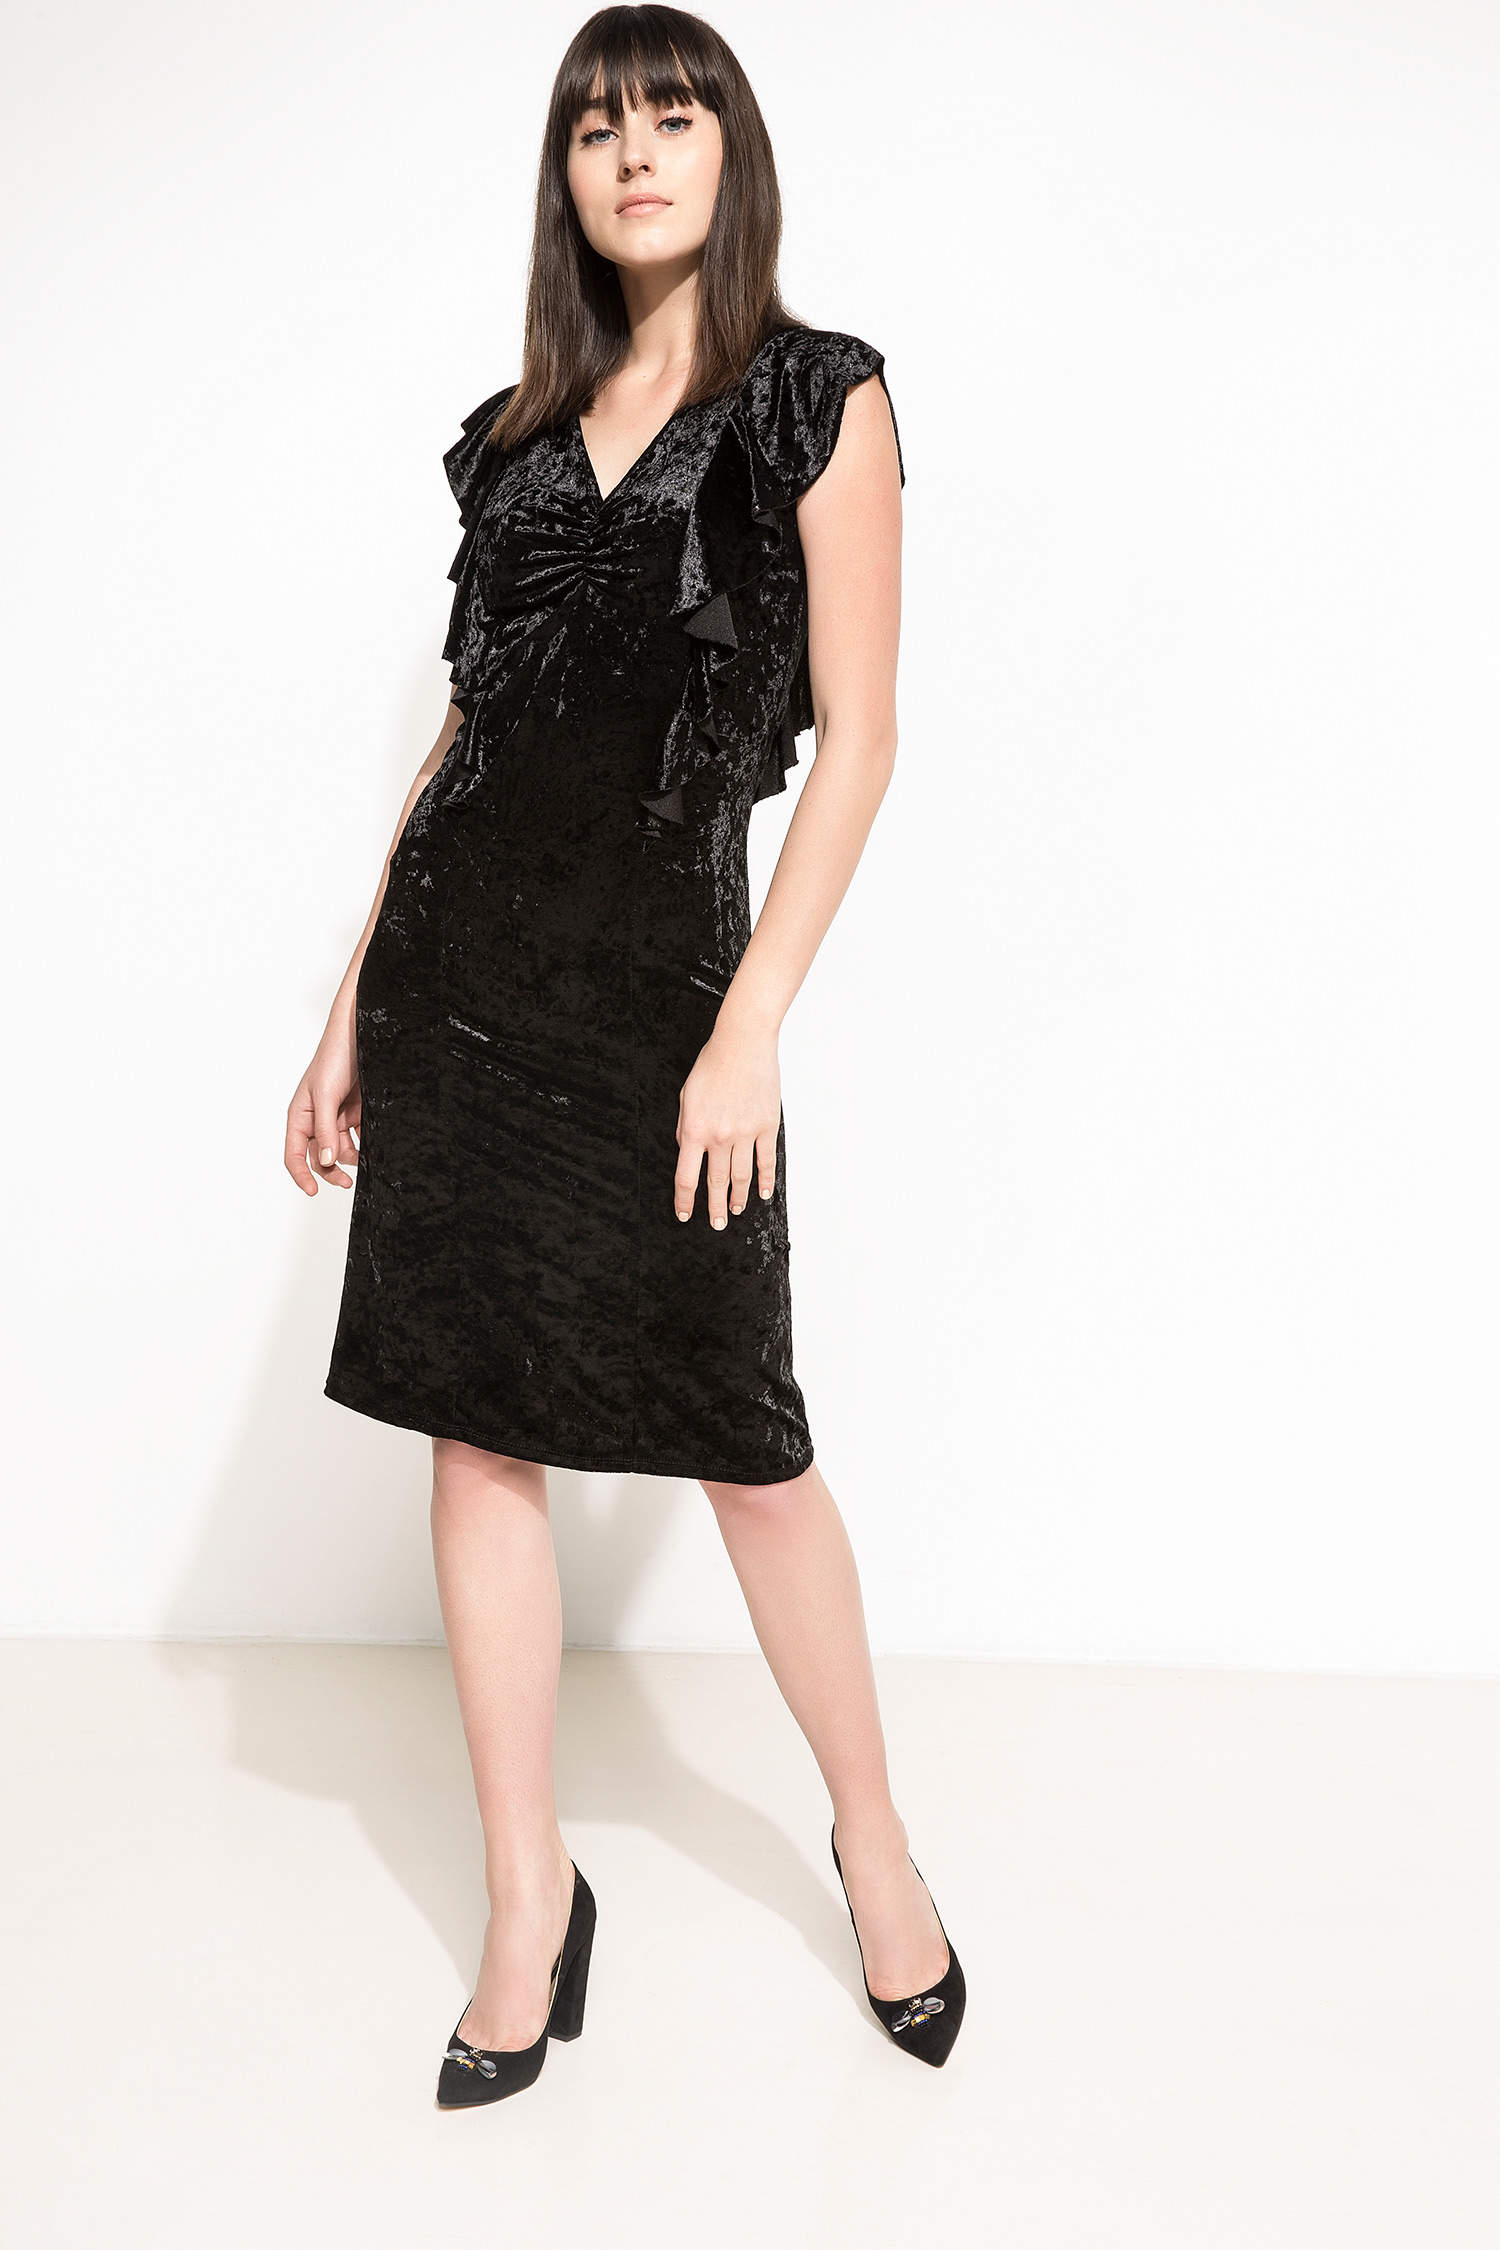 a9ea97c6a4c79 Siyah Kadın Fırfır Detaylı Elbise 797390 | DeFacto